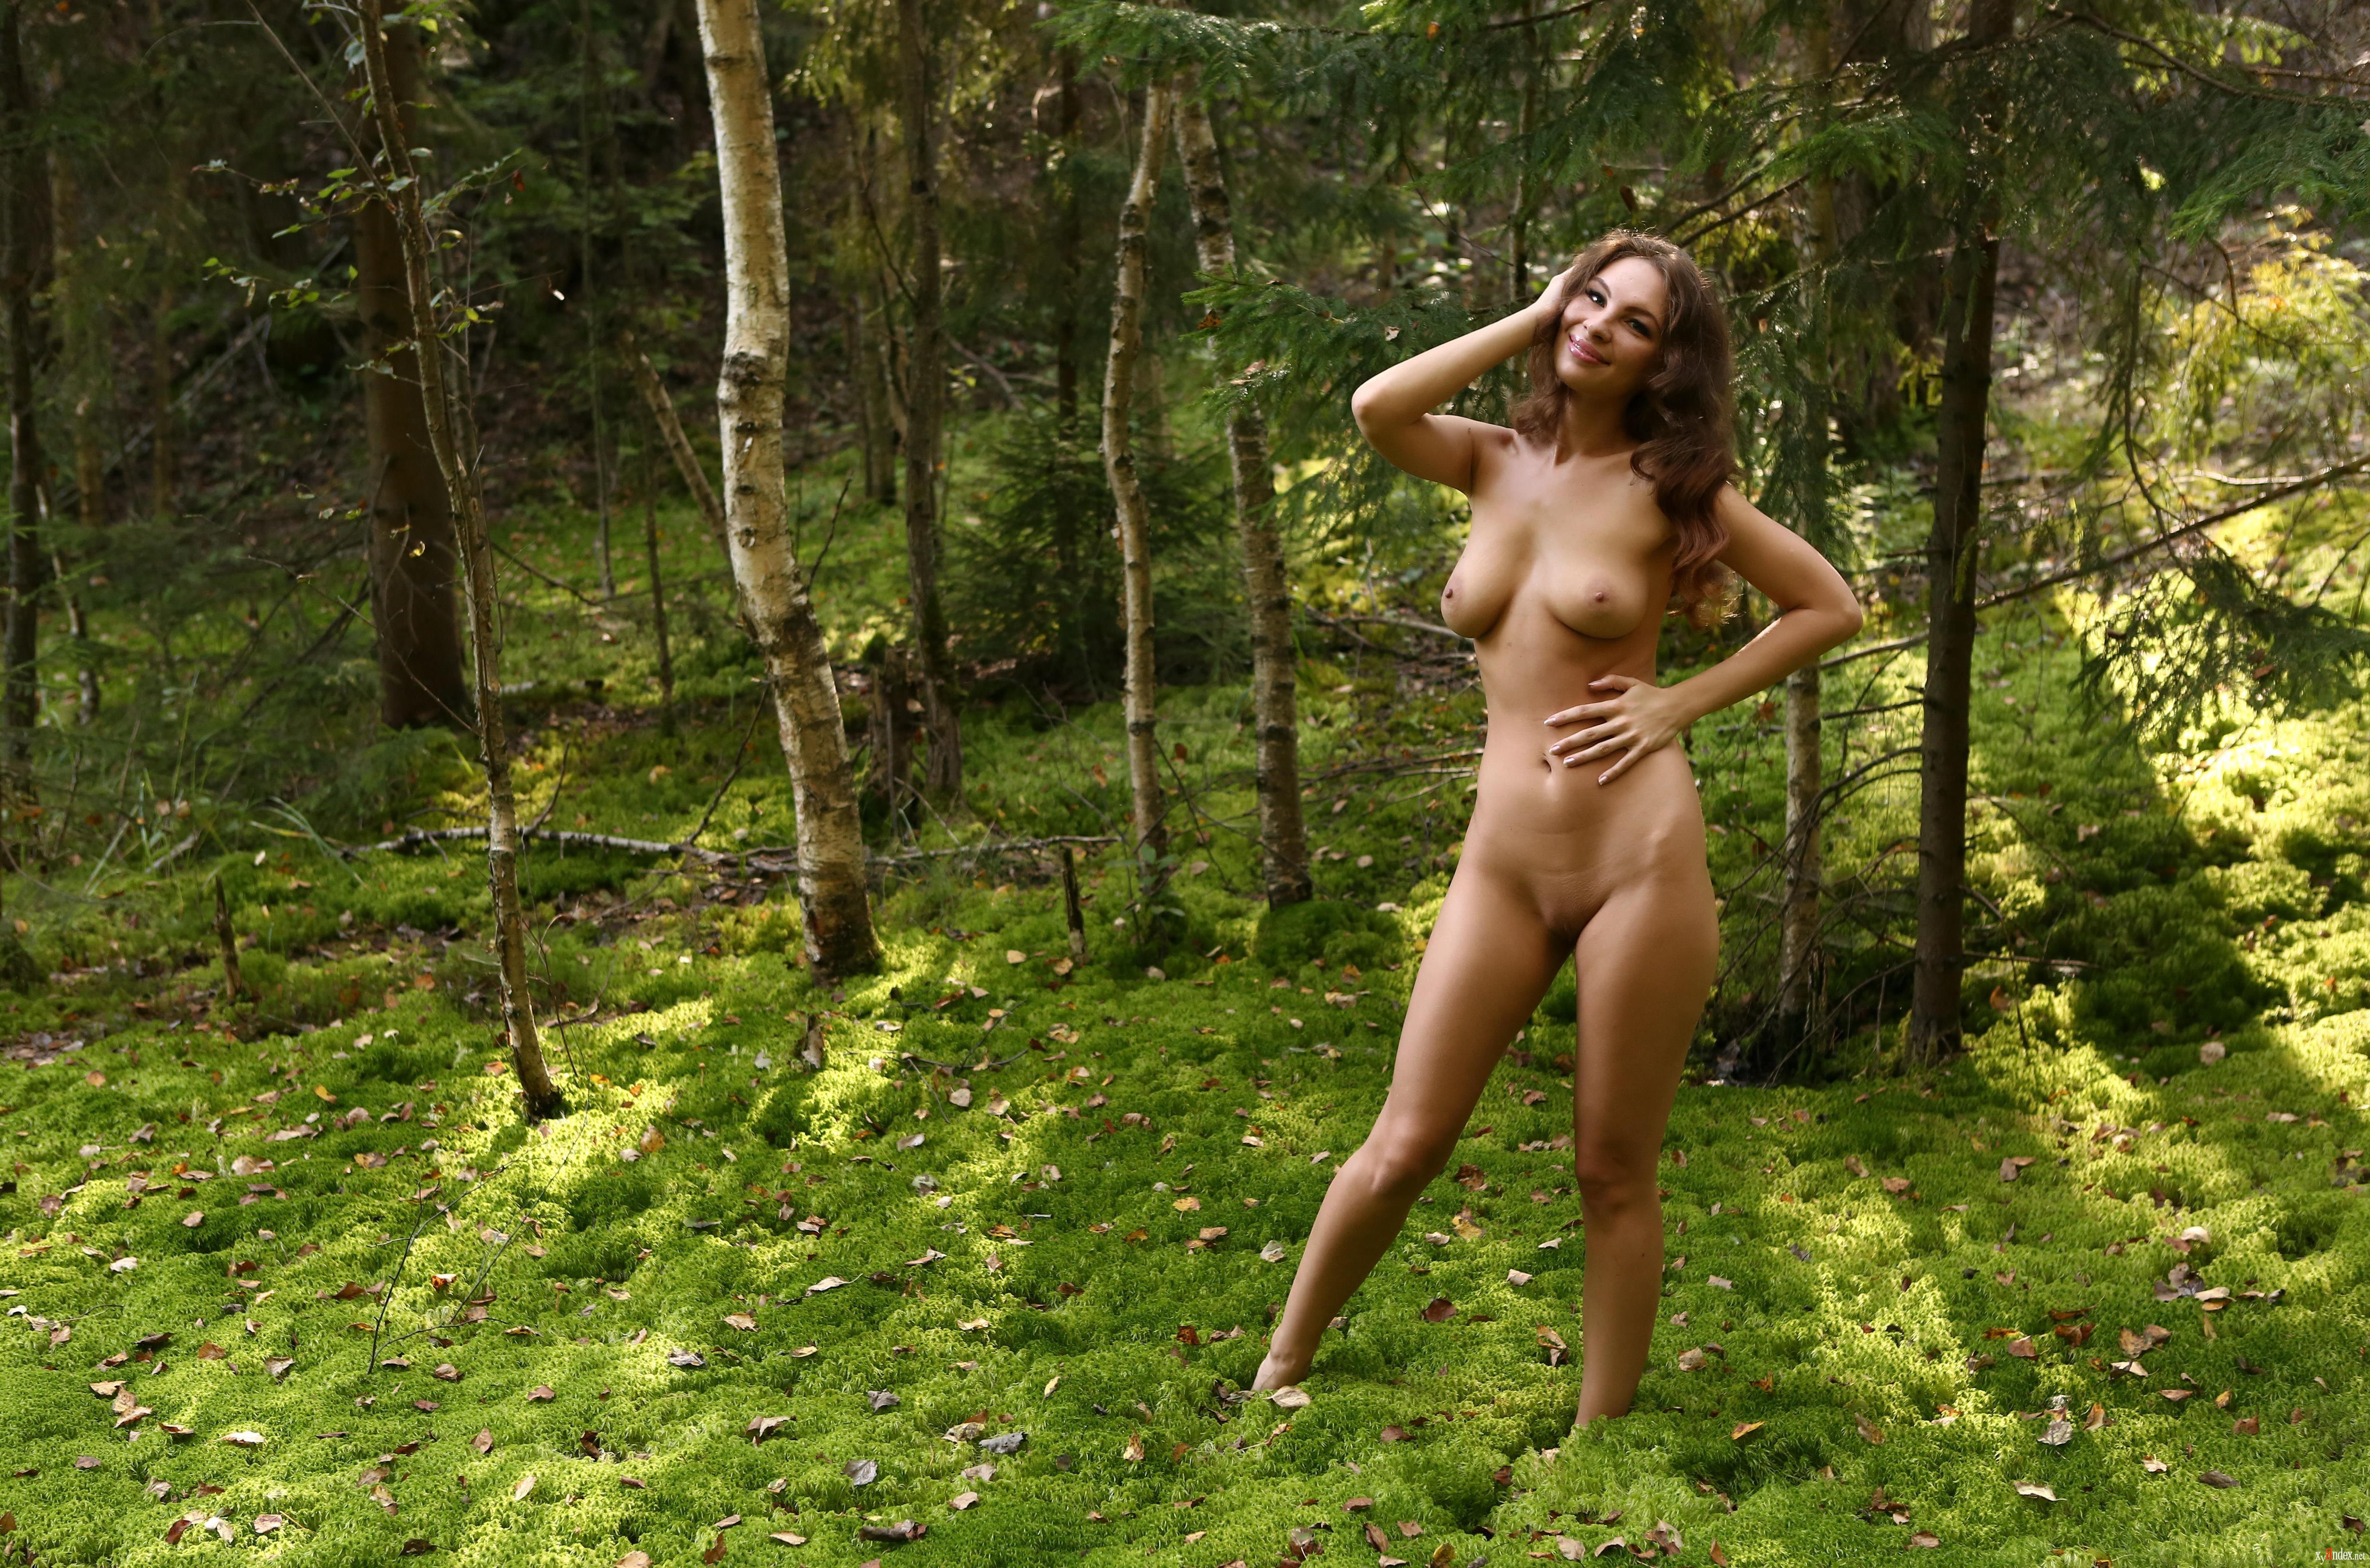 sveta-razdelas-v-lesu-i-sela-na-kolenki-kino-seks-s-russkimi-studentami